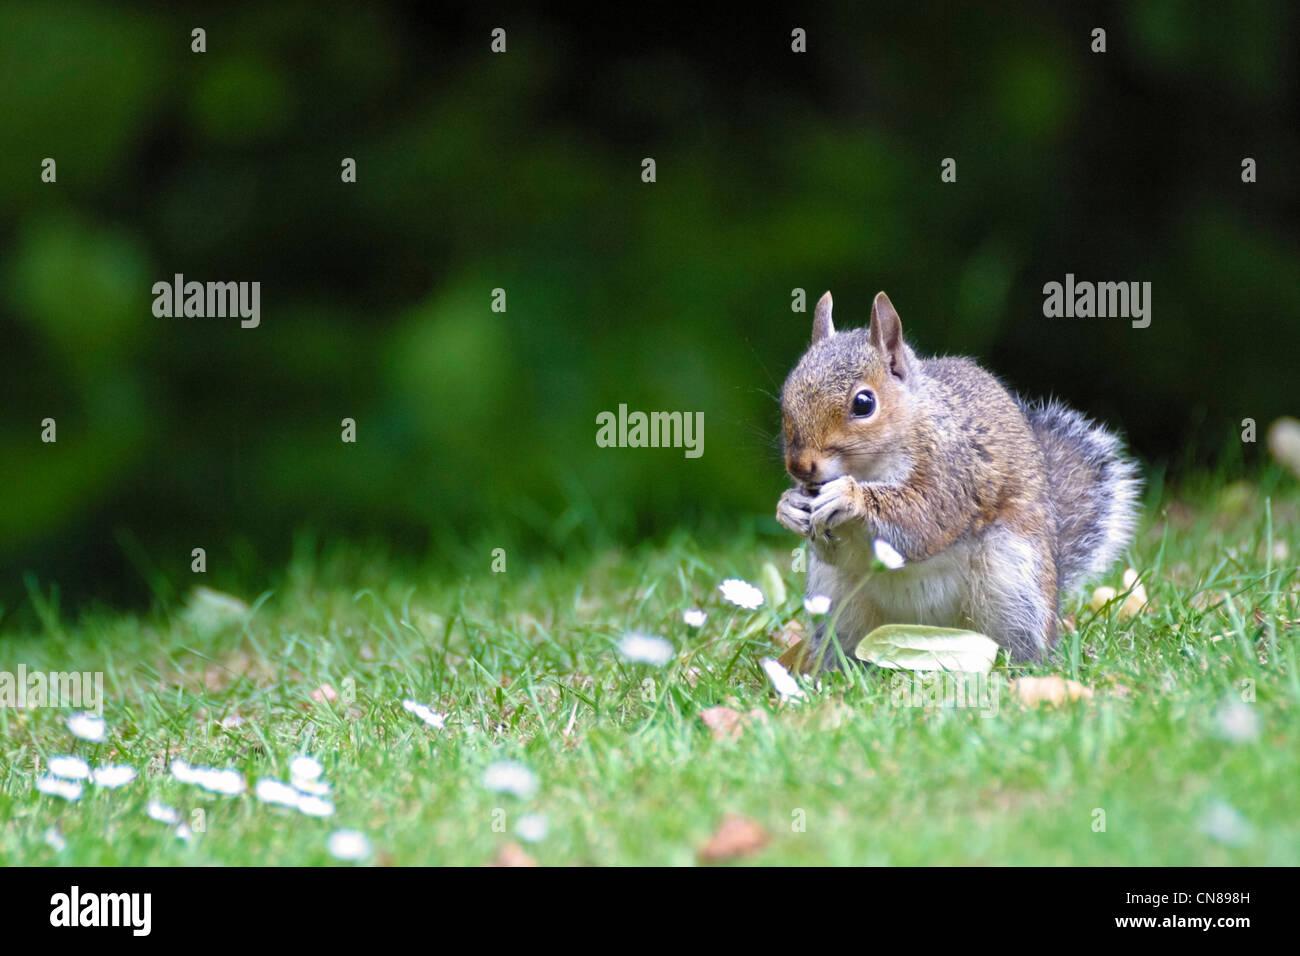 squirrel stockfotos squirrel bilder alamy. Black Bedroom Furniture Sets. Home Design Ideas